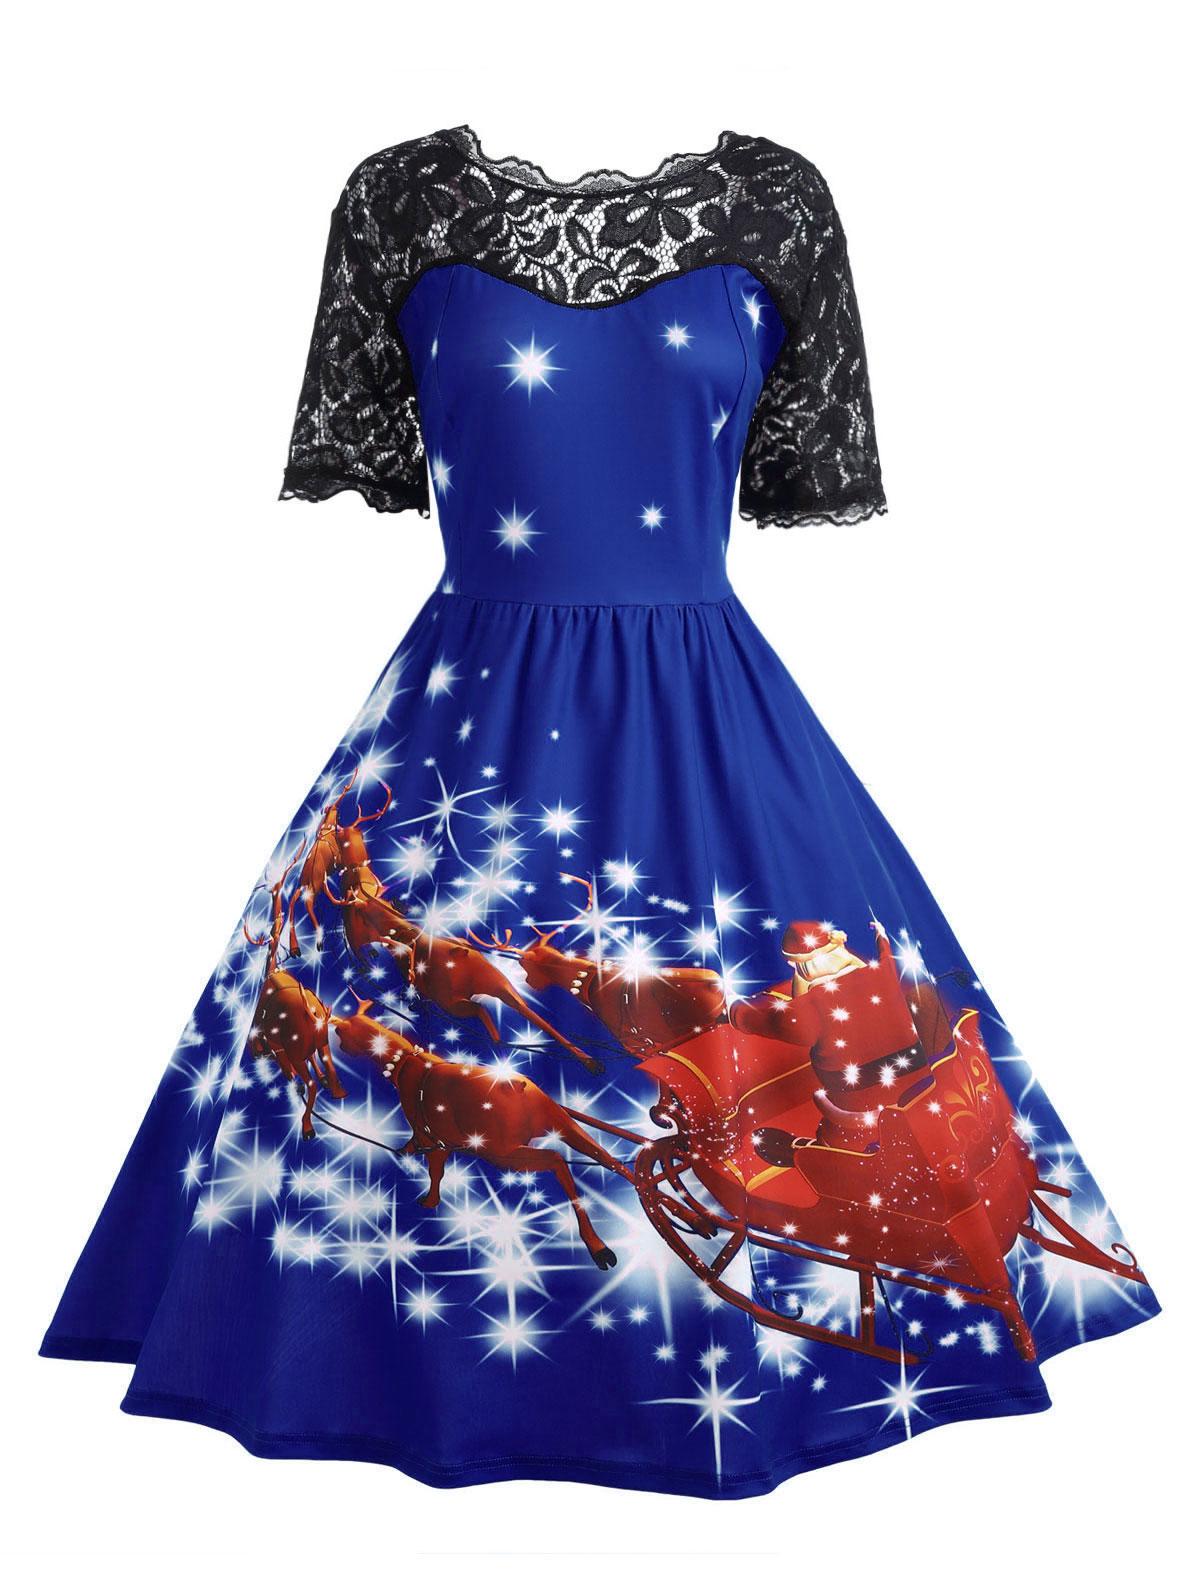 7033ad526f Gamiss Women Christmas Lace Panel Father Midi Party Dress Ladies Autumn  Vintage Insert Robe Femme Plus Size 5XL 4XL Vestidos